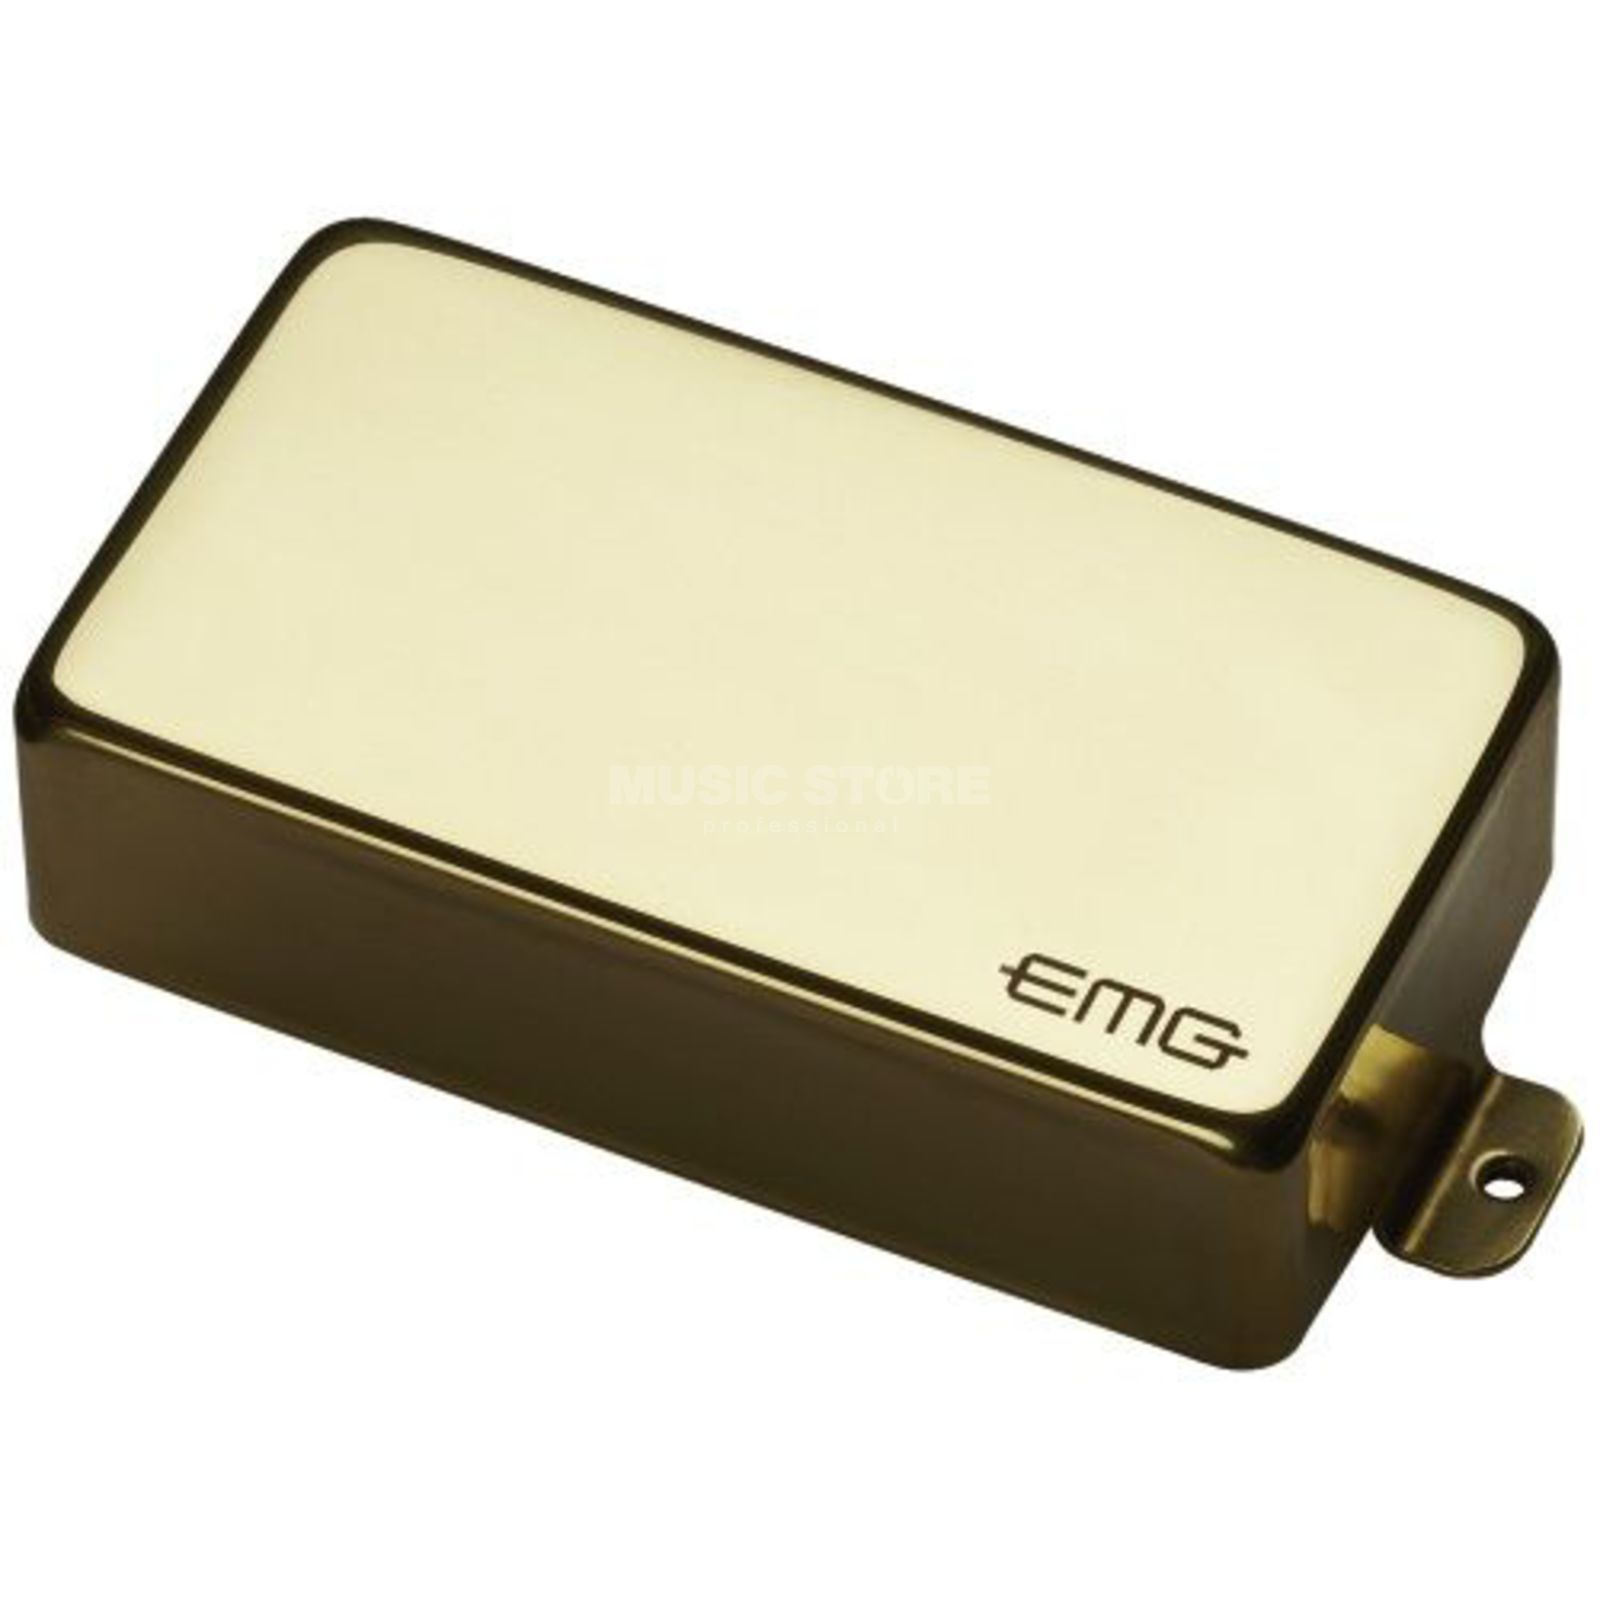 Emg 81 G Gold Aktiv Humbucker Gold